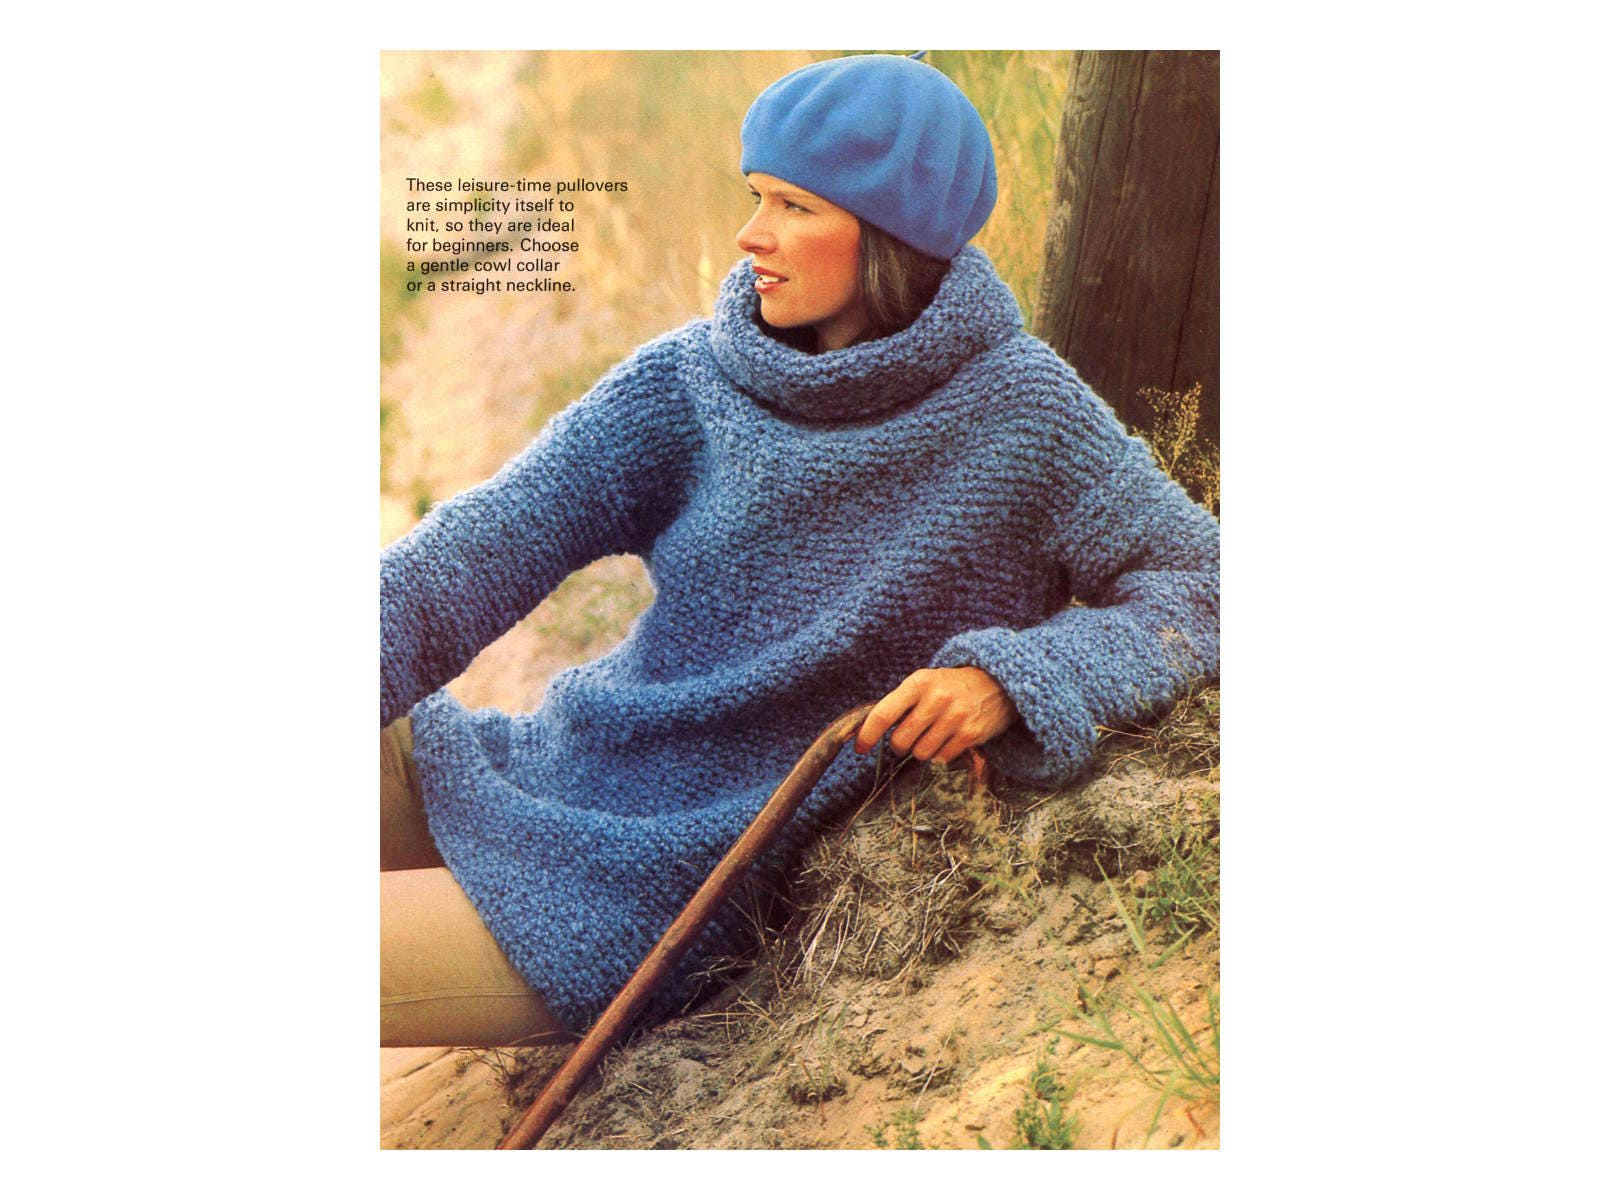 Sweater Knitting Pattern Cowl Neck Turtleneck Etsy